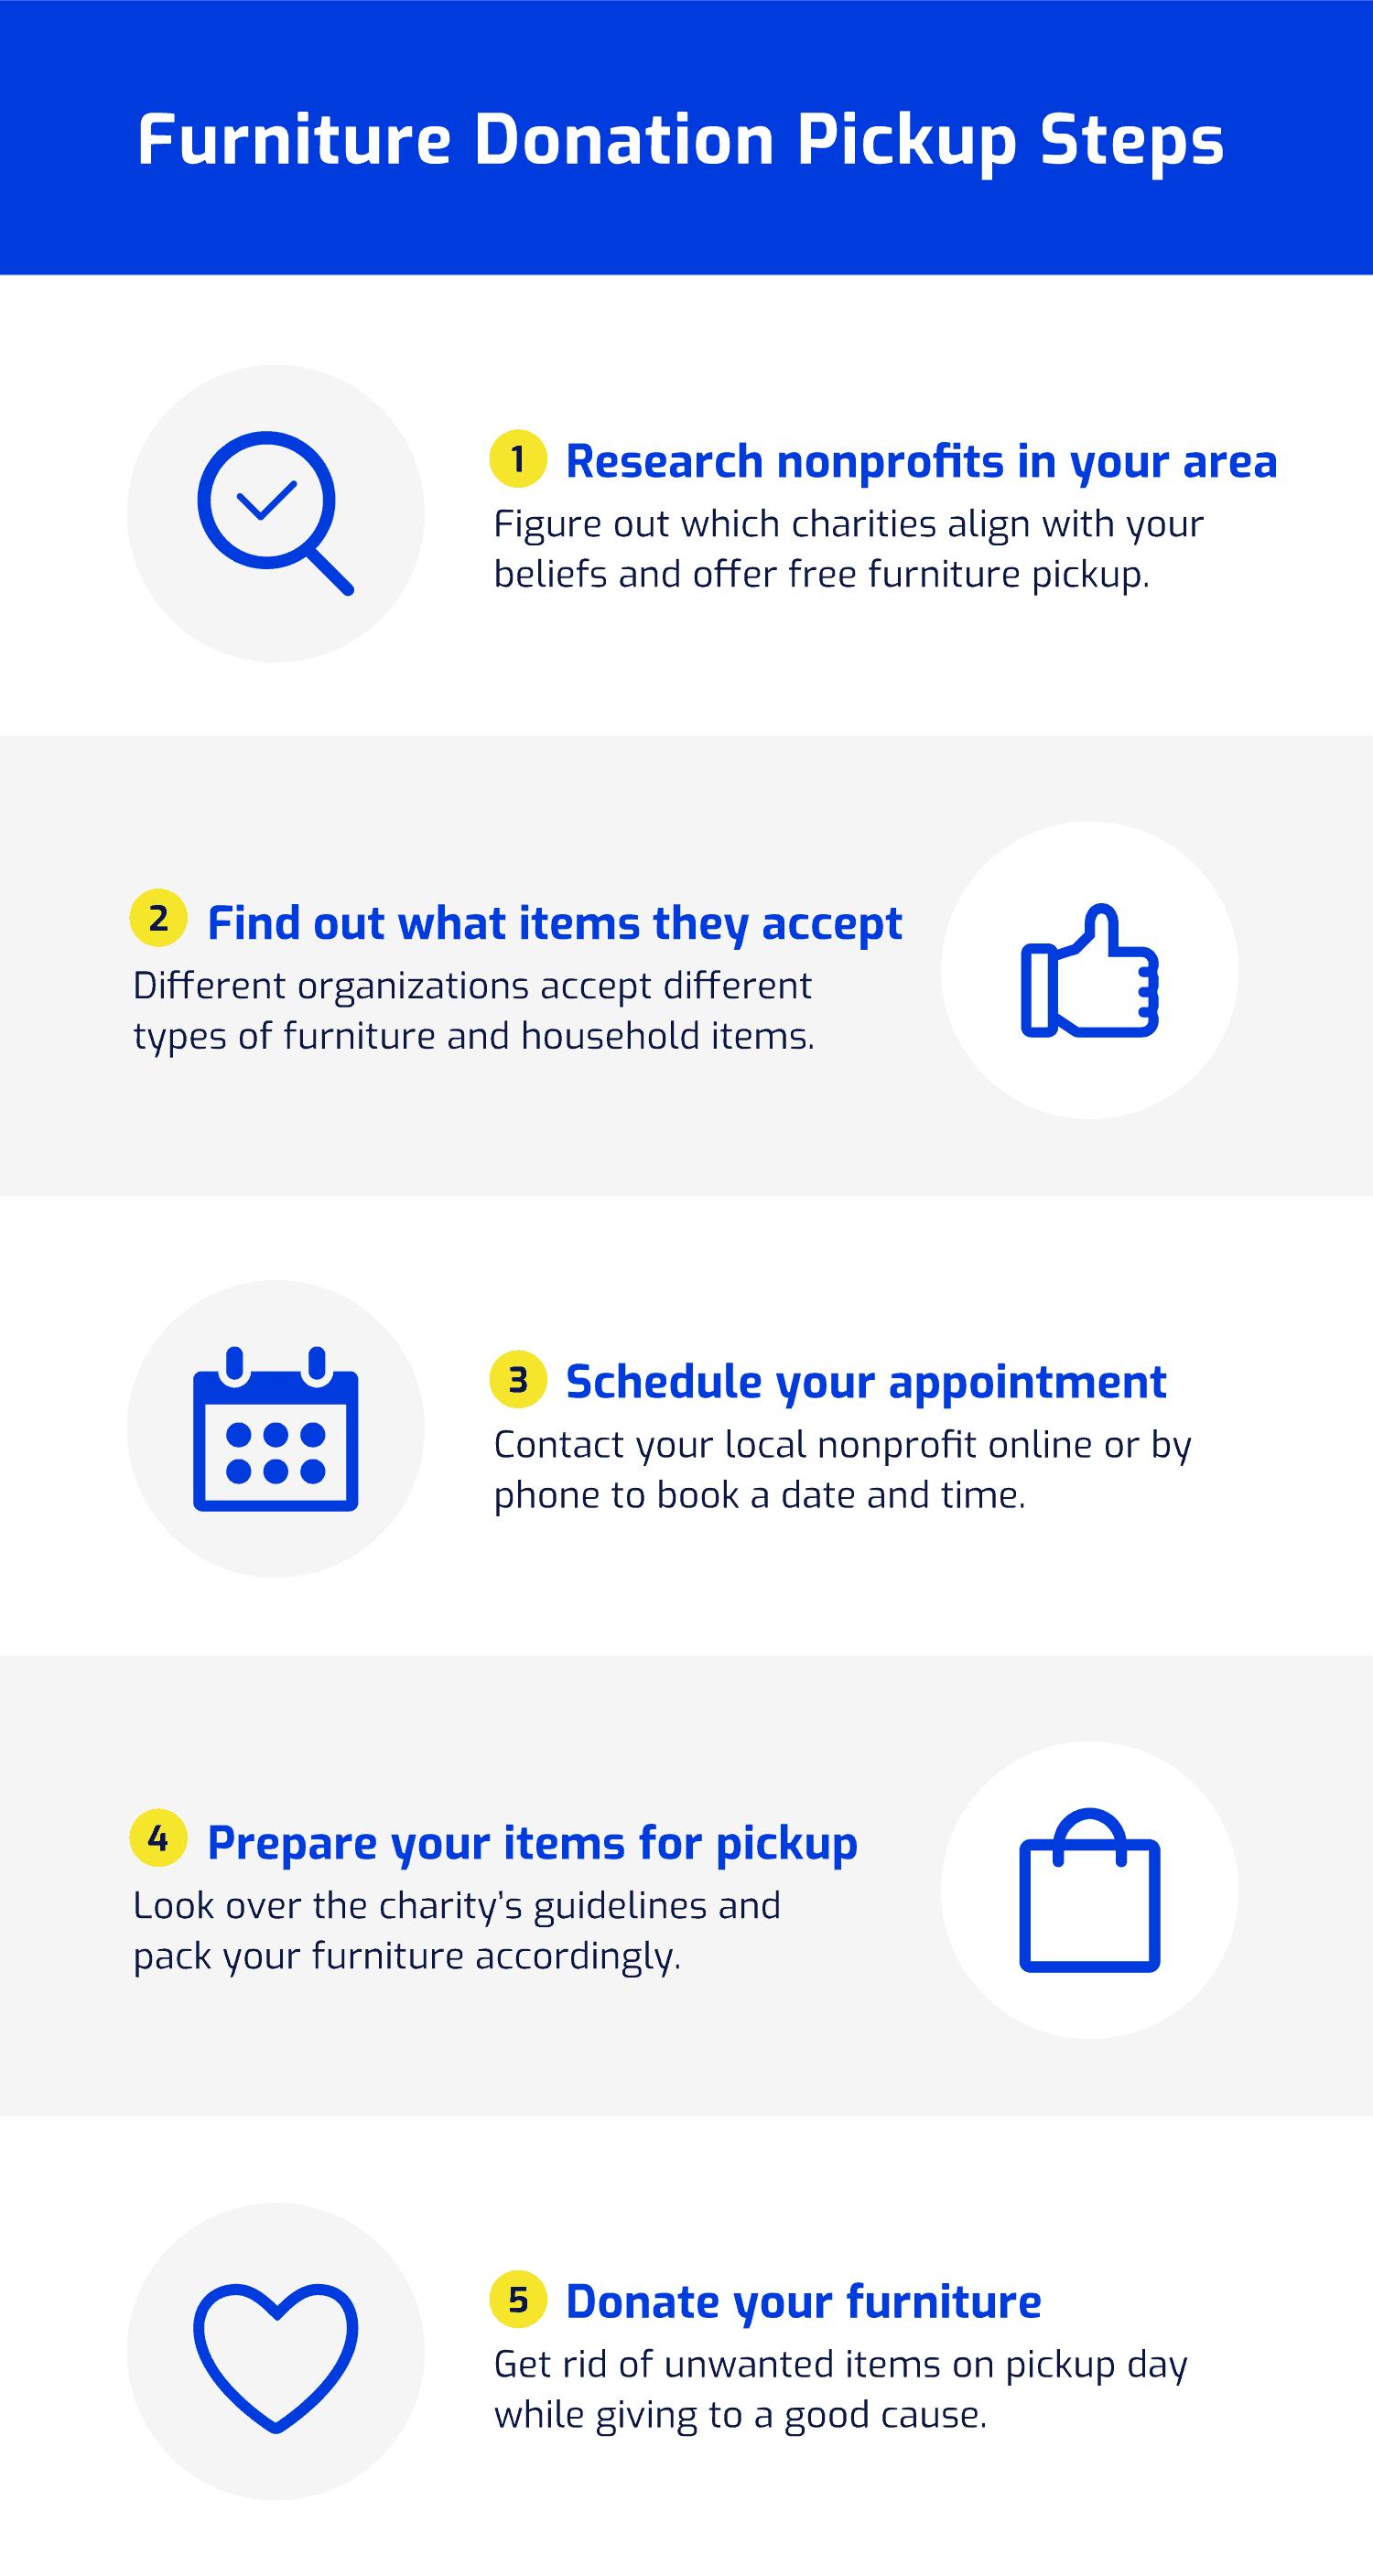 Steps for furniture donation pick up